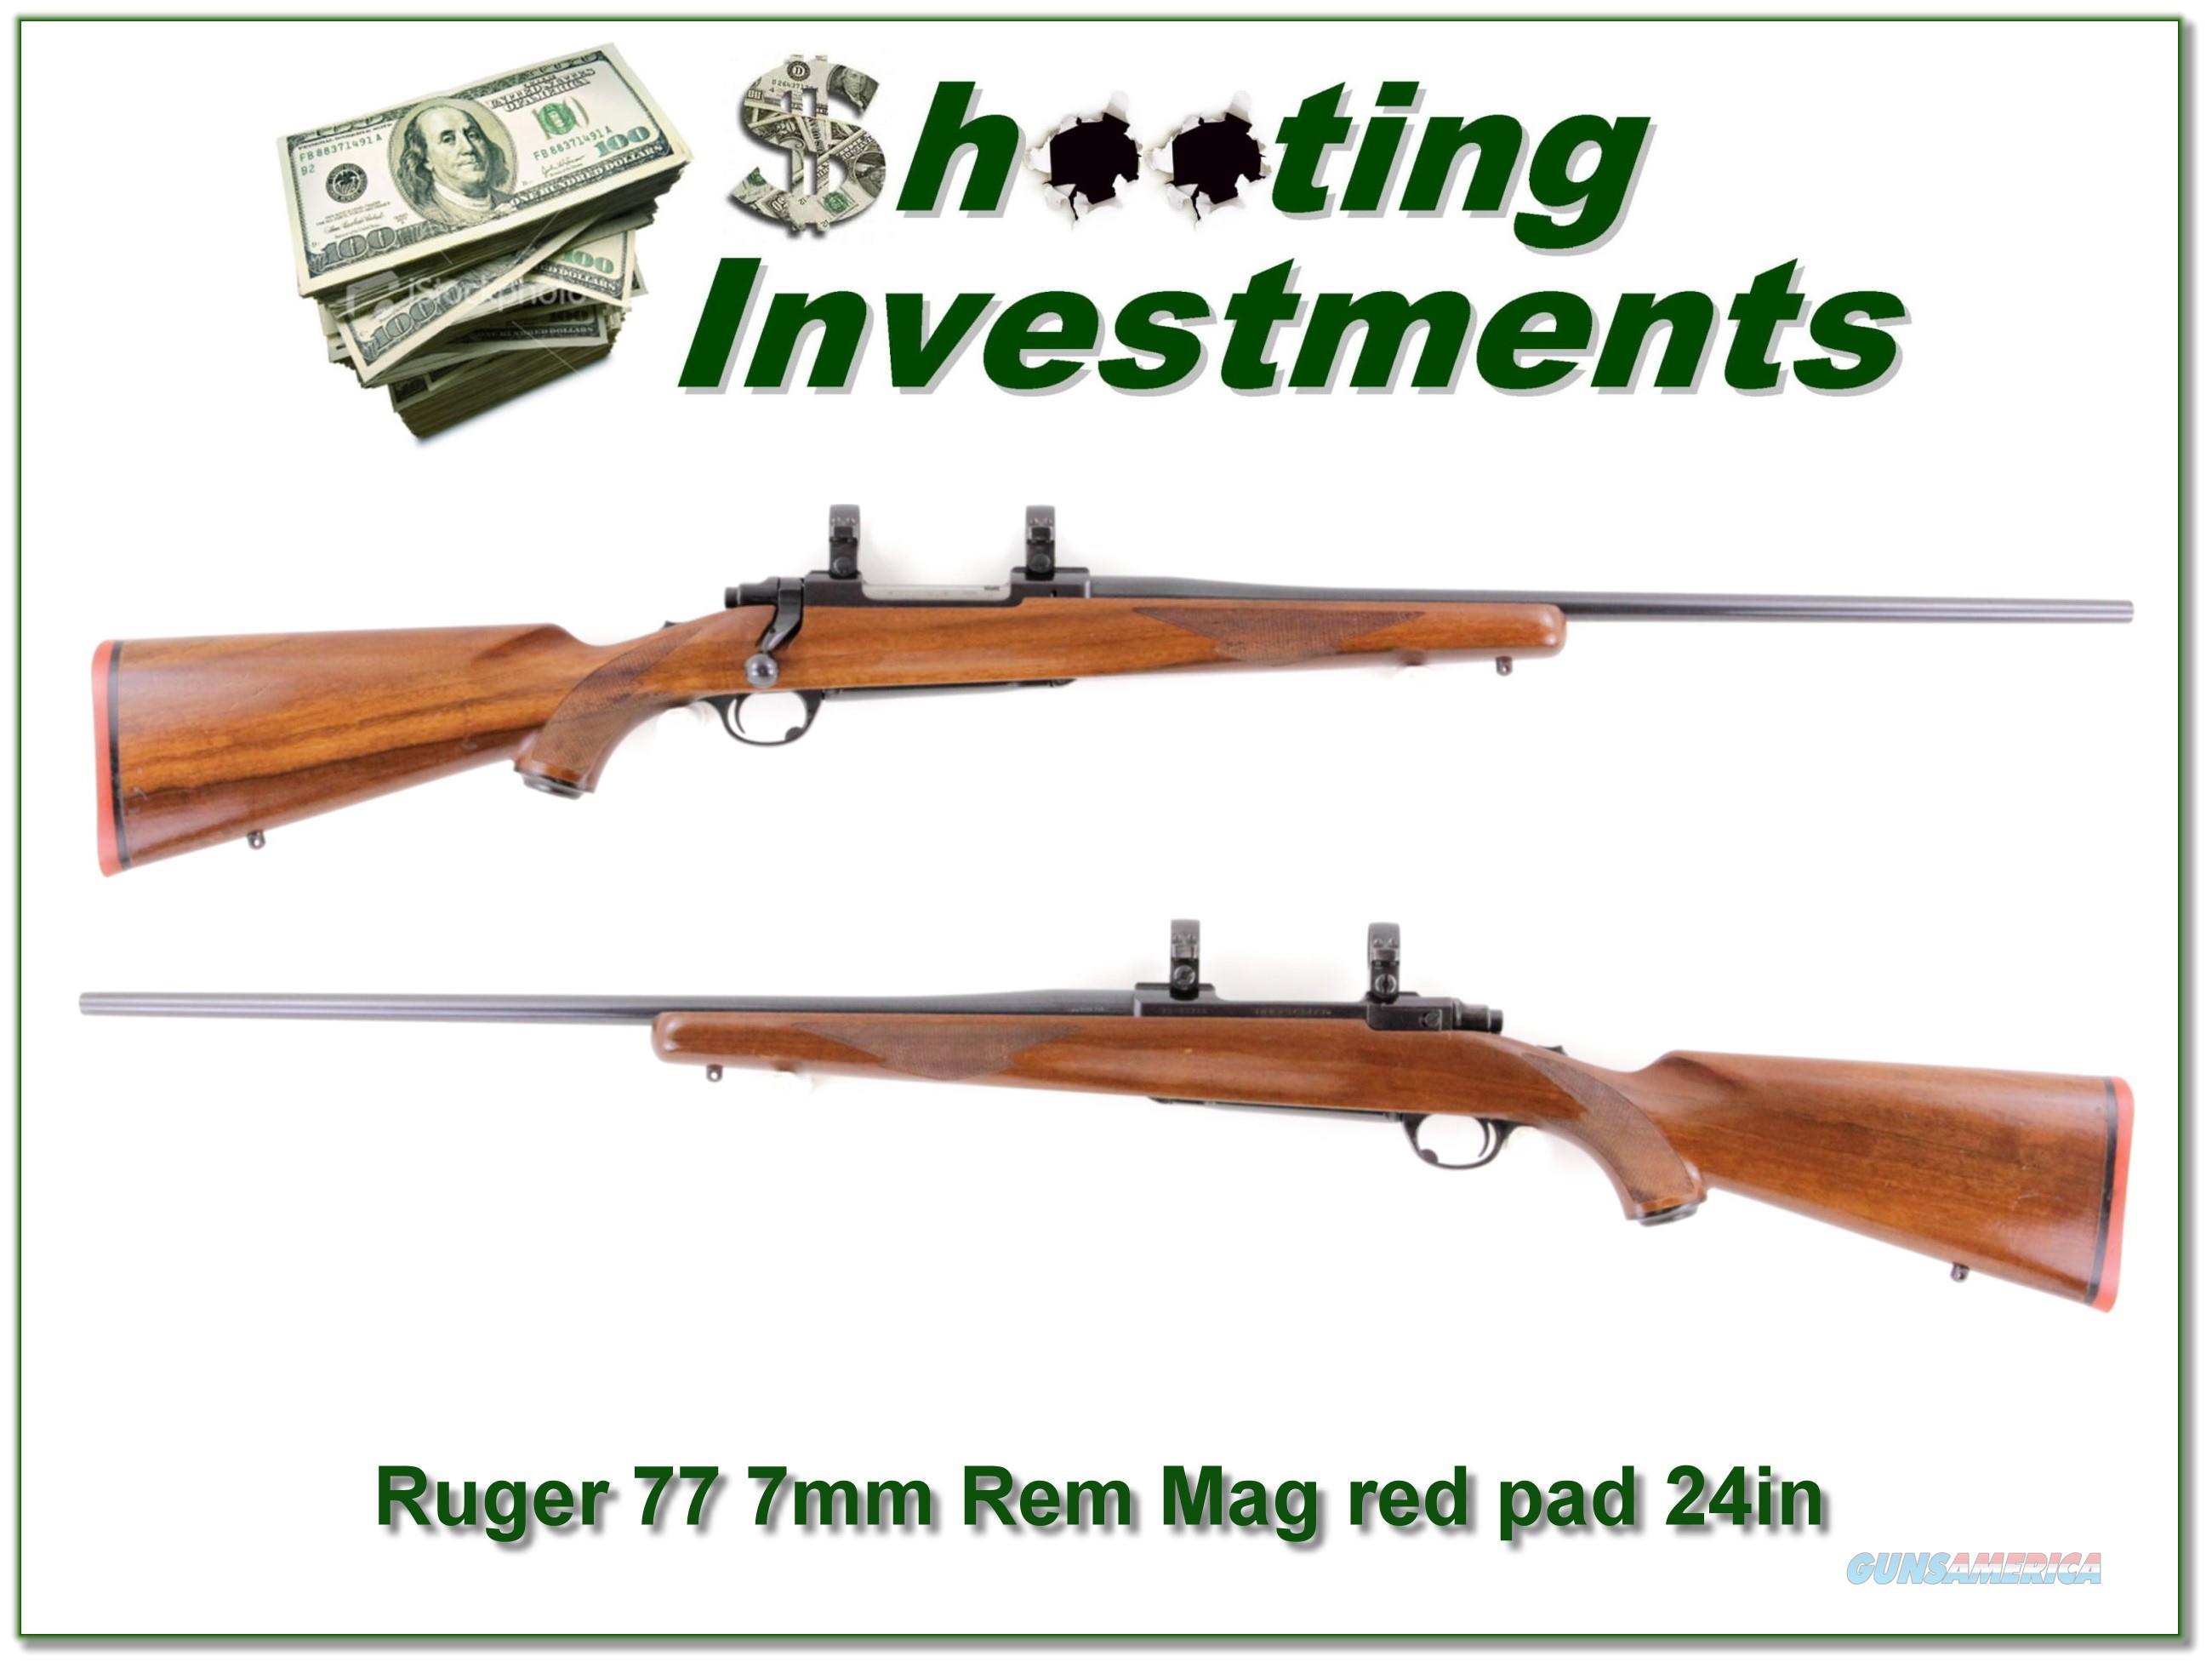 Ruger 77 Tang Safety Red Pad 7mm Rem Mag  Guns > Rifles > Ruger Rifles > Model 77